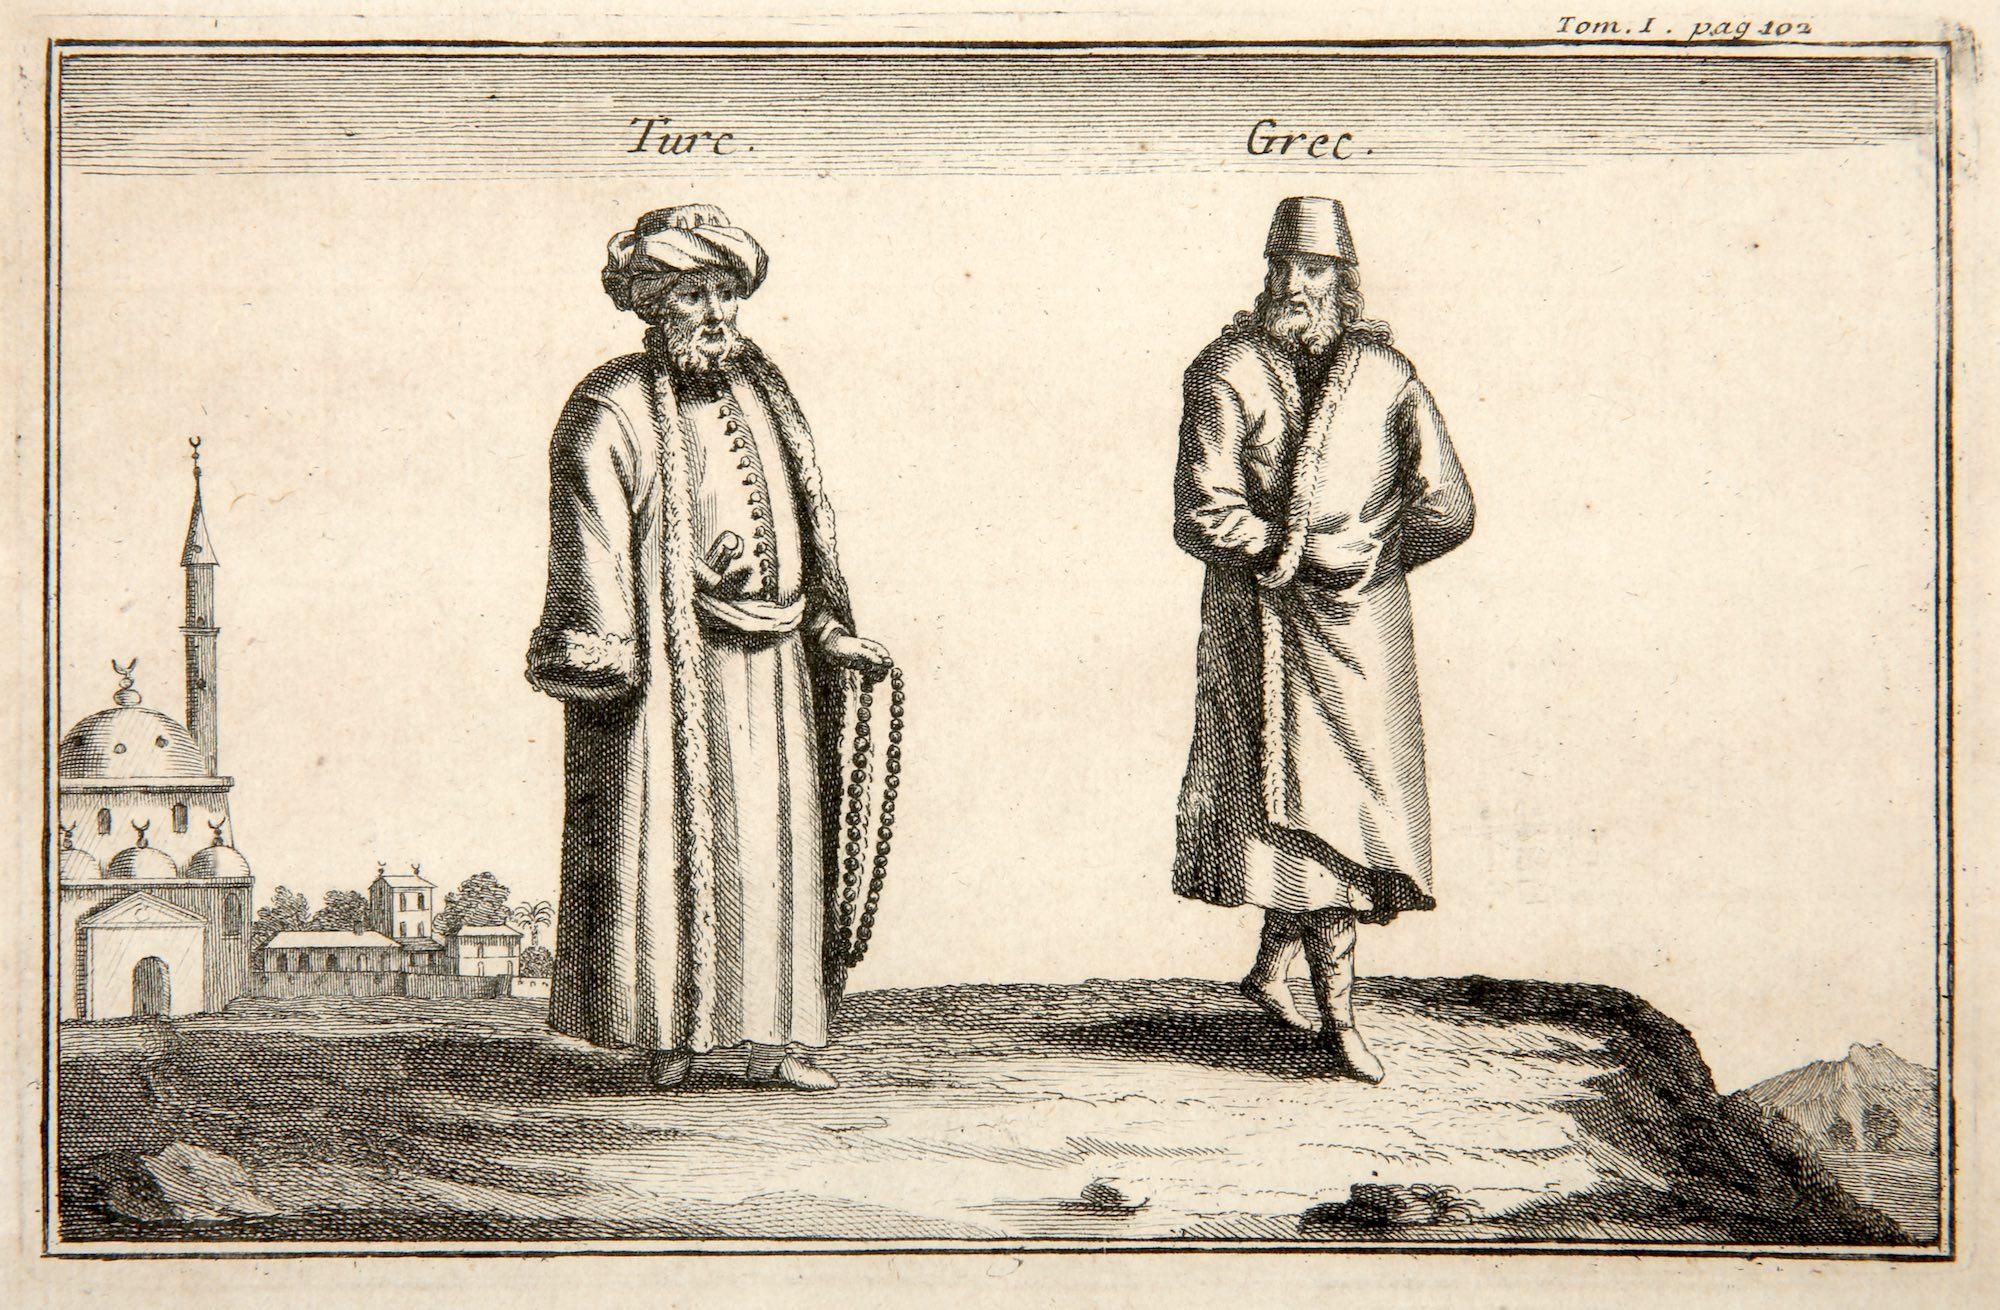 Joseph Pitton de Tournefort | Turc, Grec